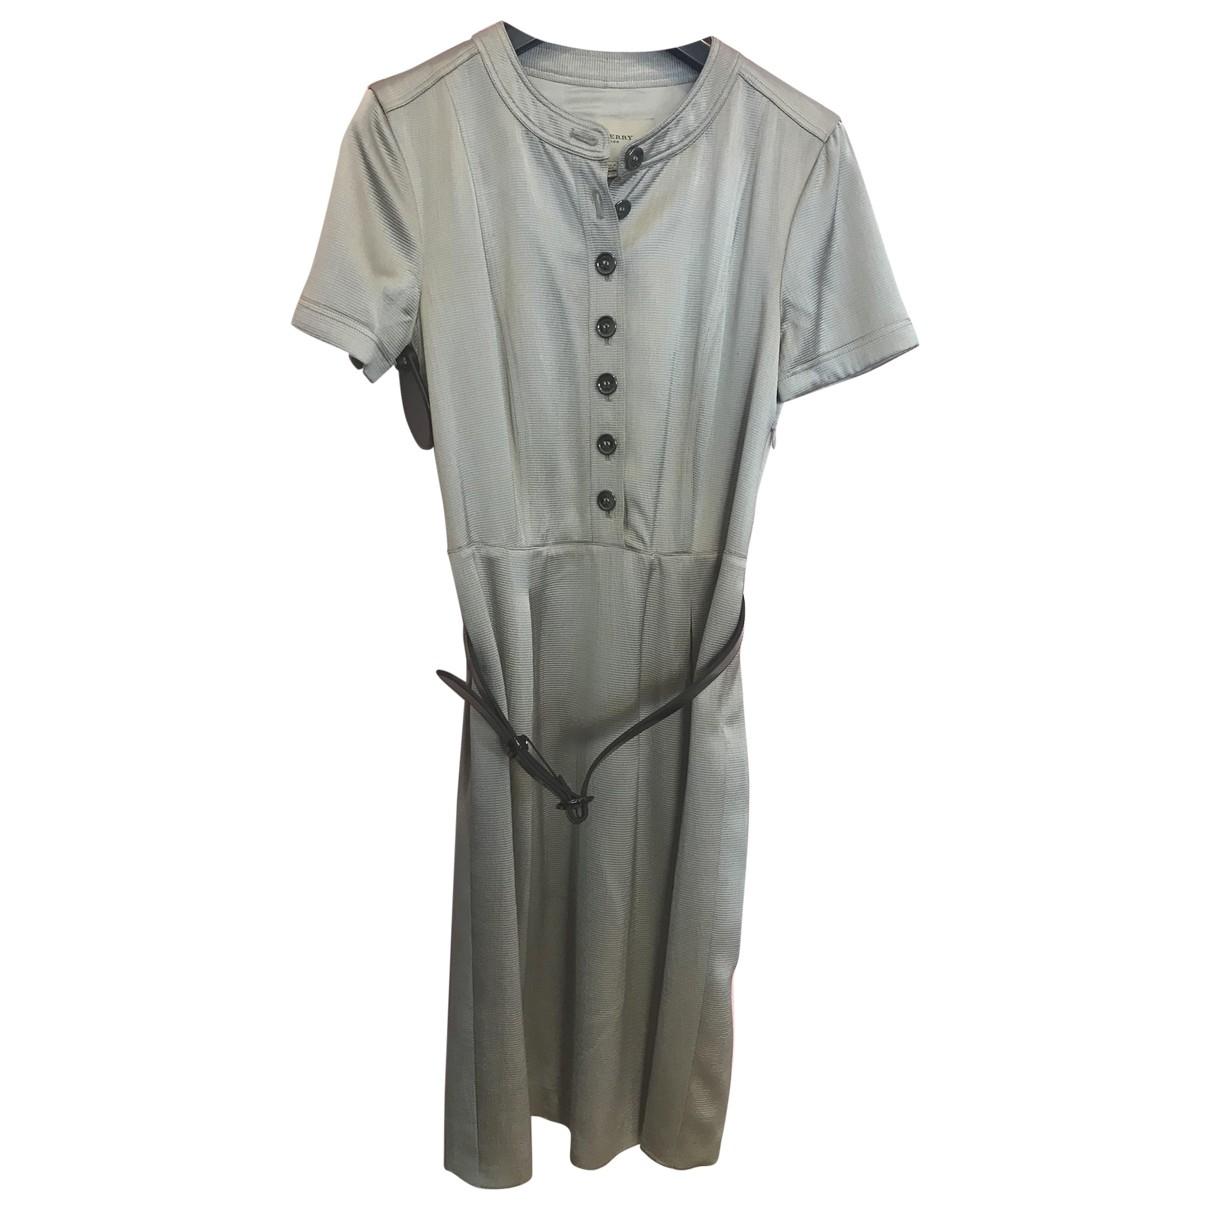 Burberry \N Grey dress for Women S International